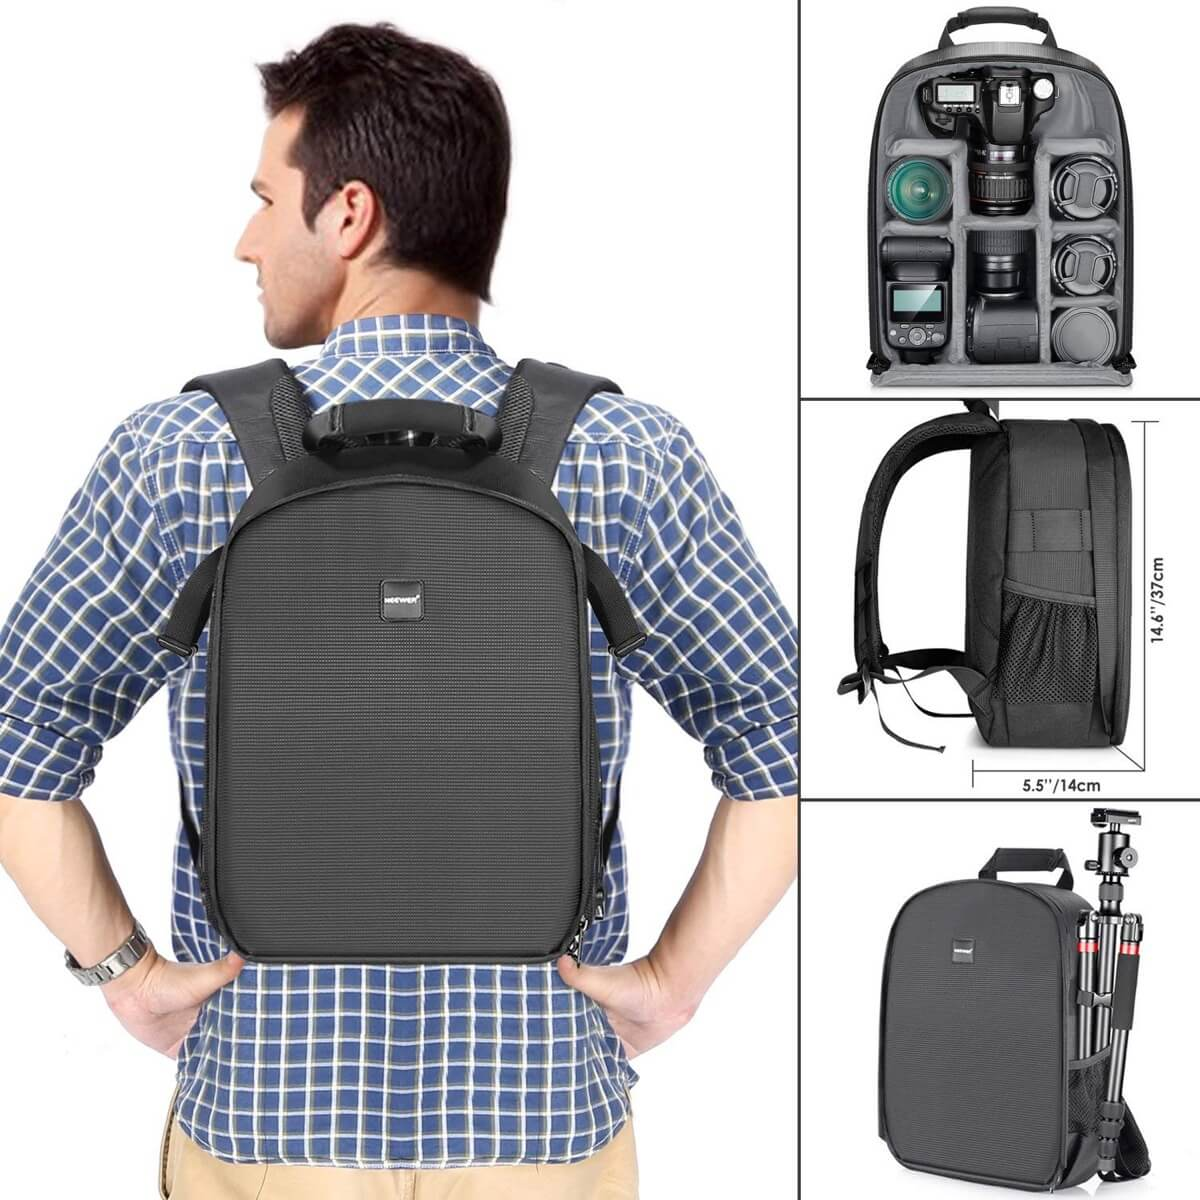 Neewer Camera Bag